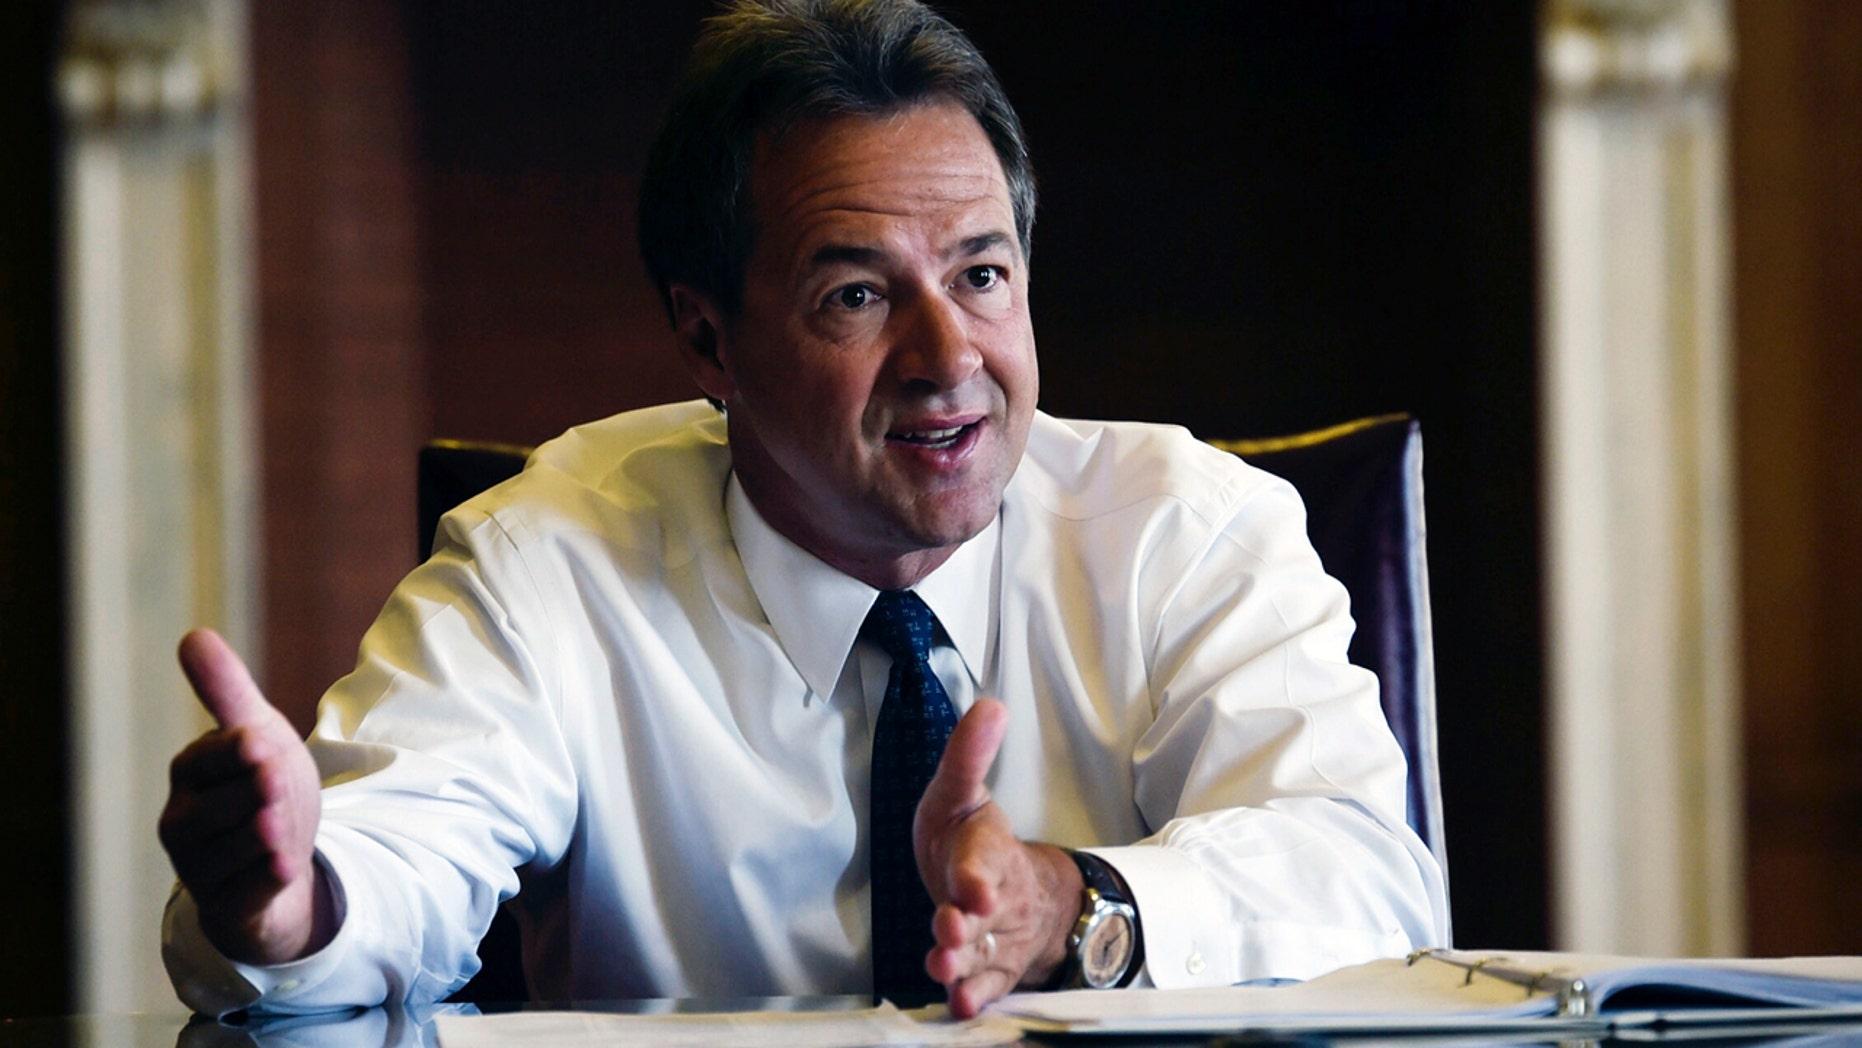 Montana Gov. Steve Bullock is believed to be considering a run for president in 2020.